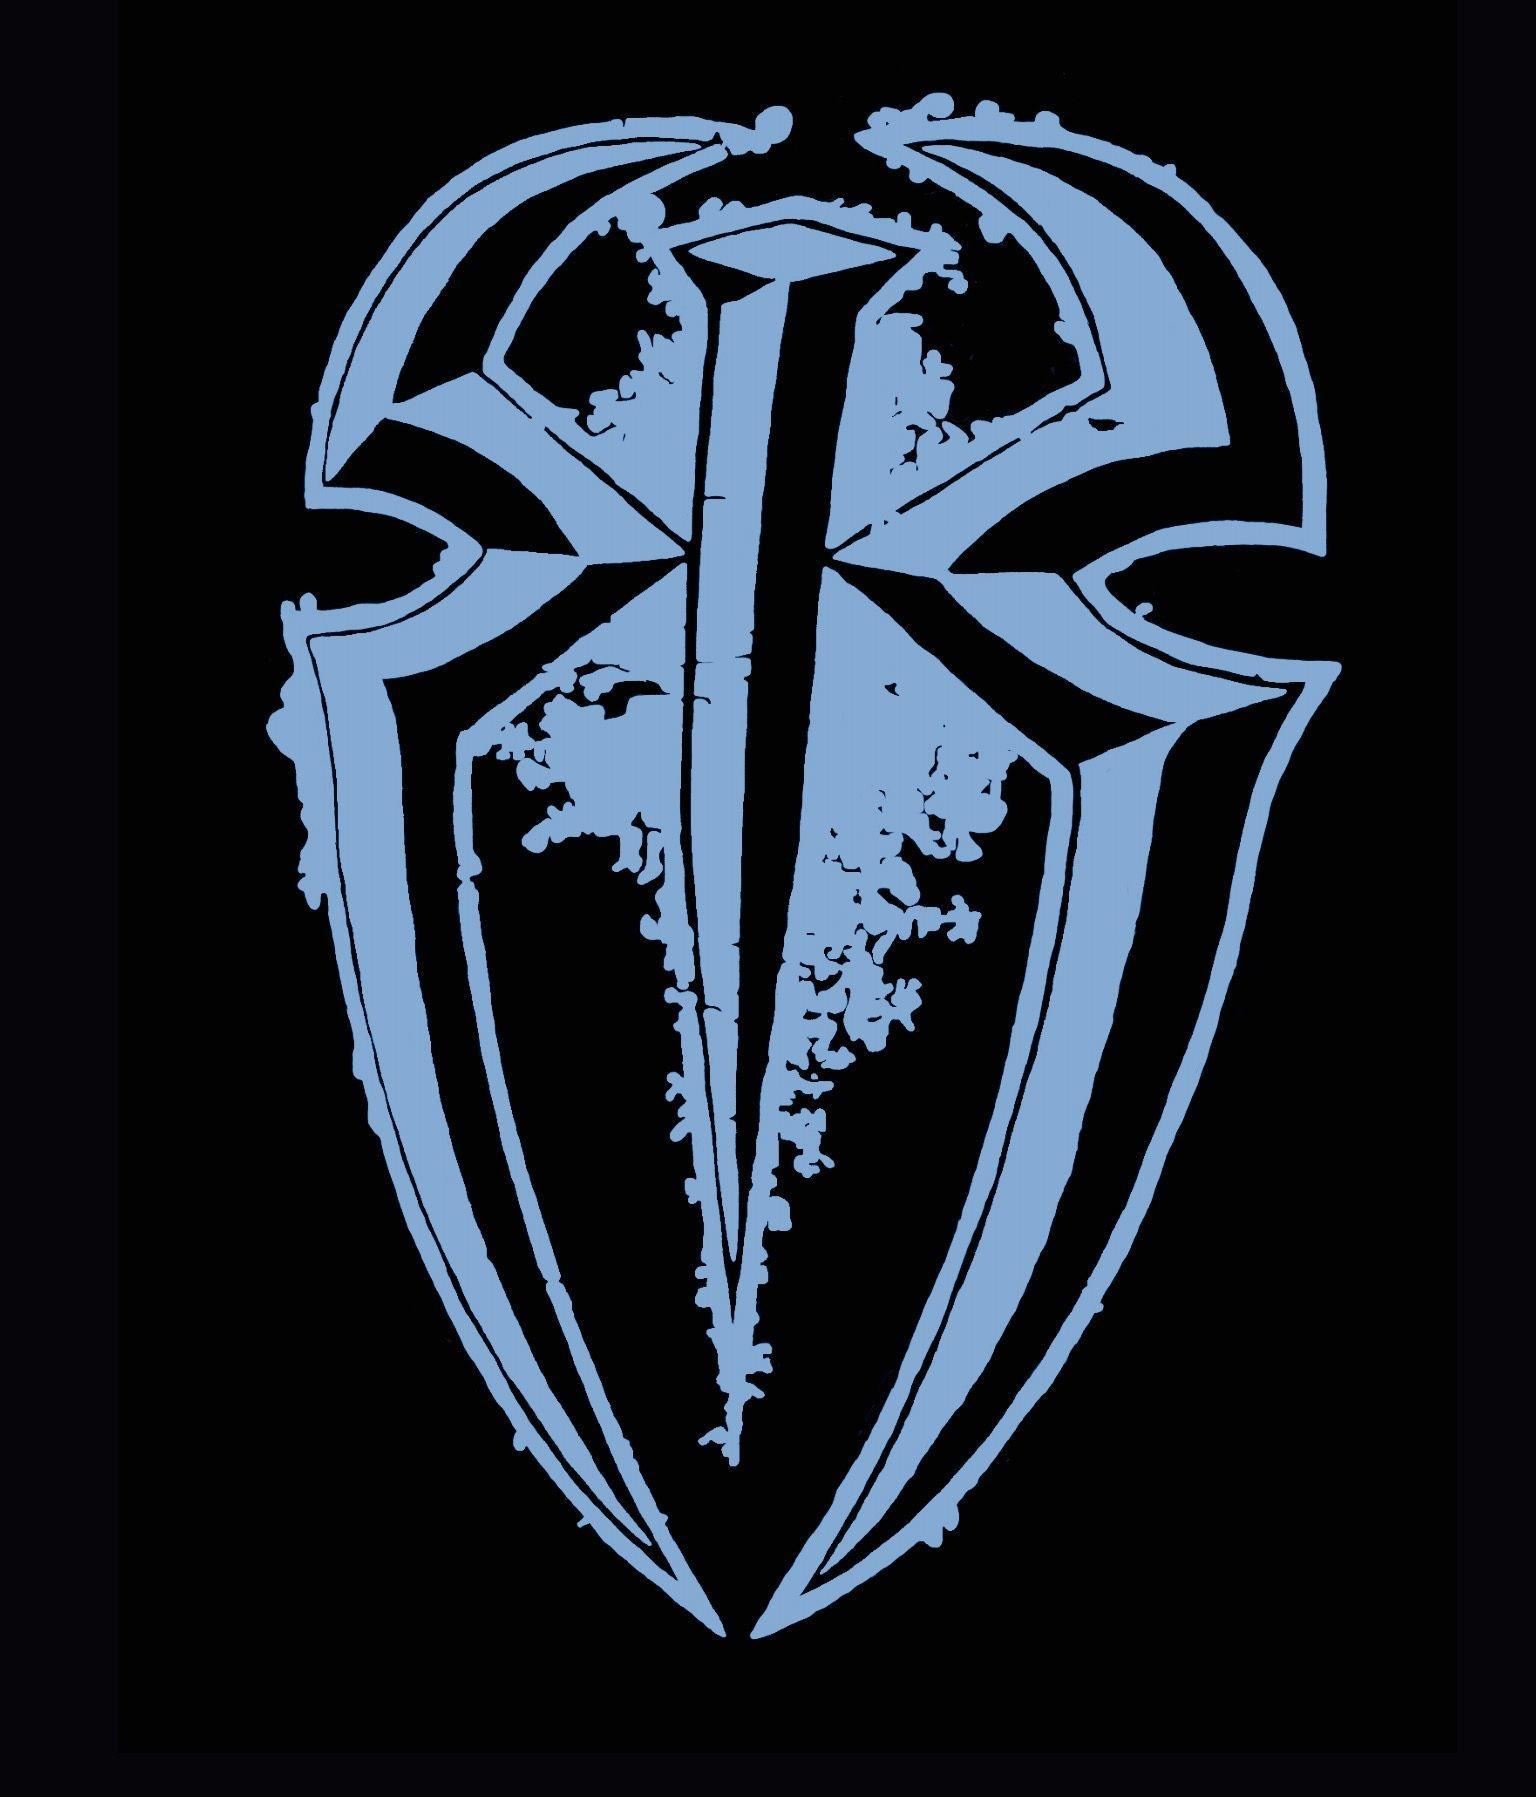 Roman Reigns Logo Wallpapers.